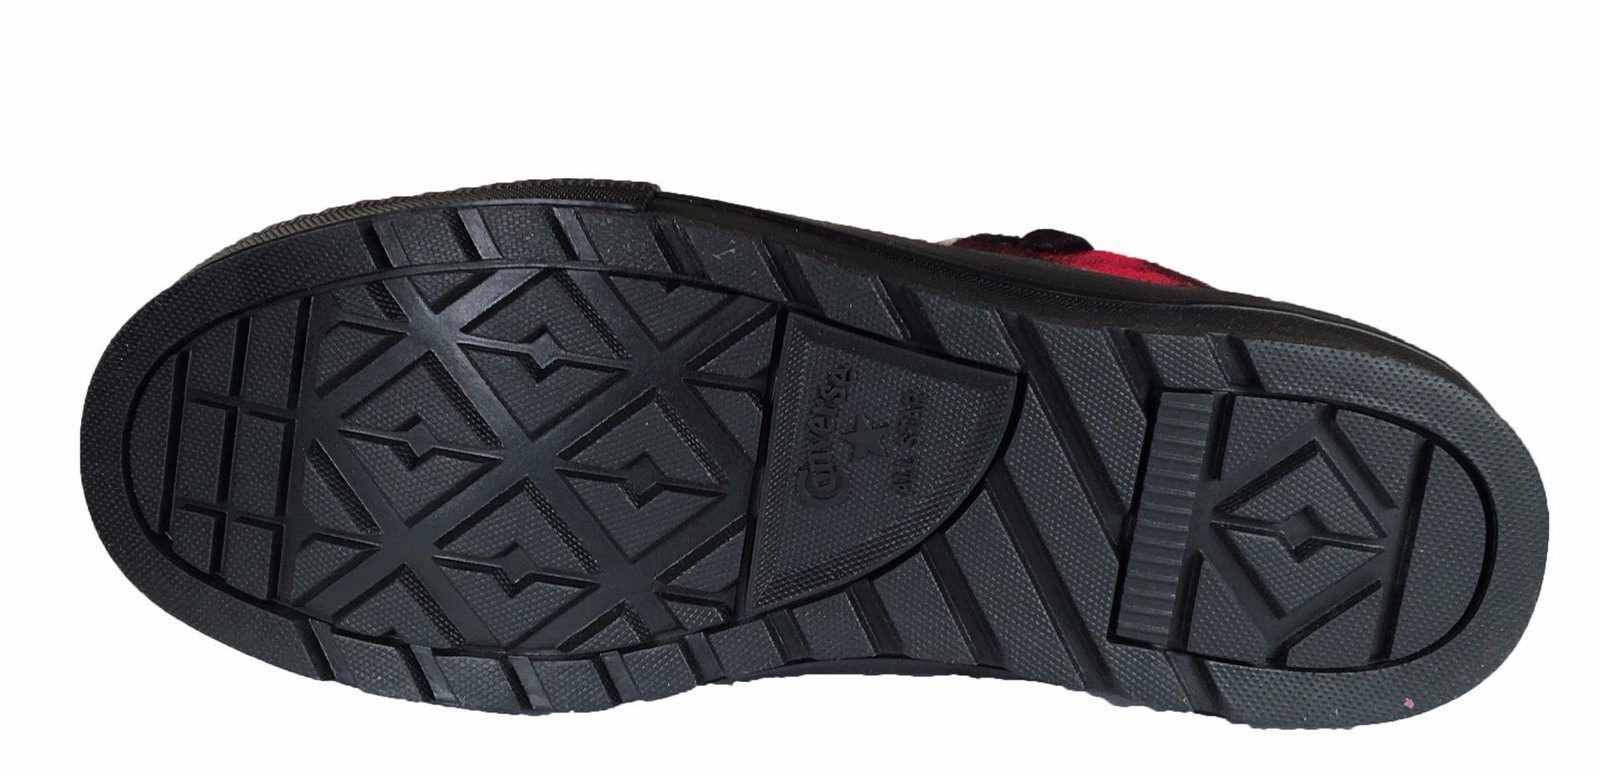 Converse Woolrich Chuck Taylor Street Hiker Sneaker Boot Red Black Plaid 153833C